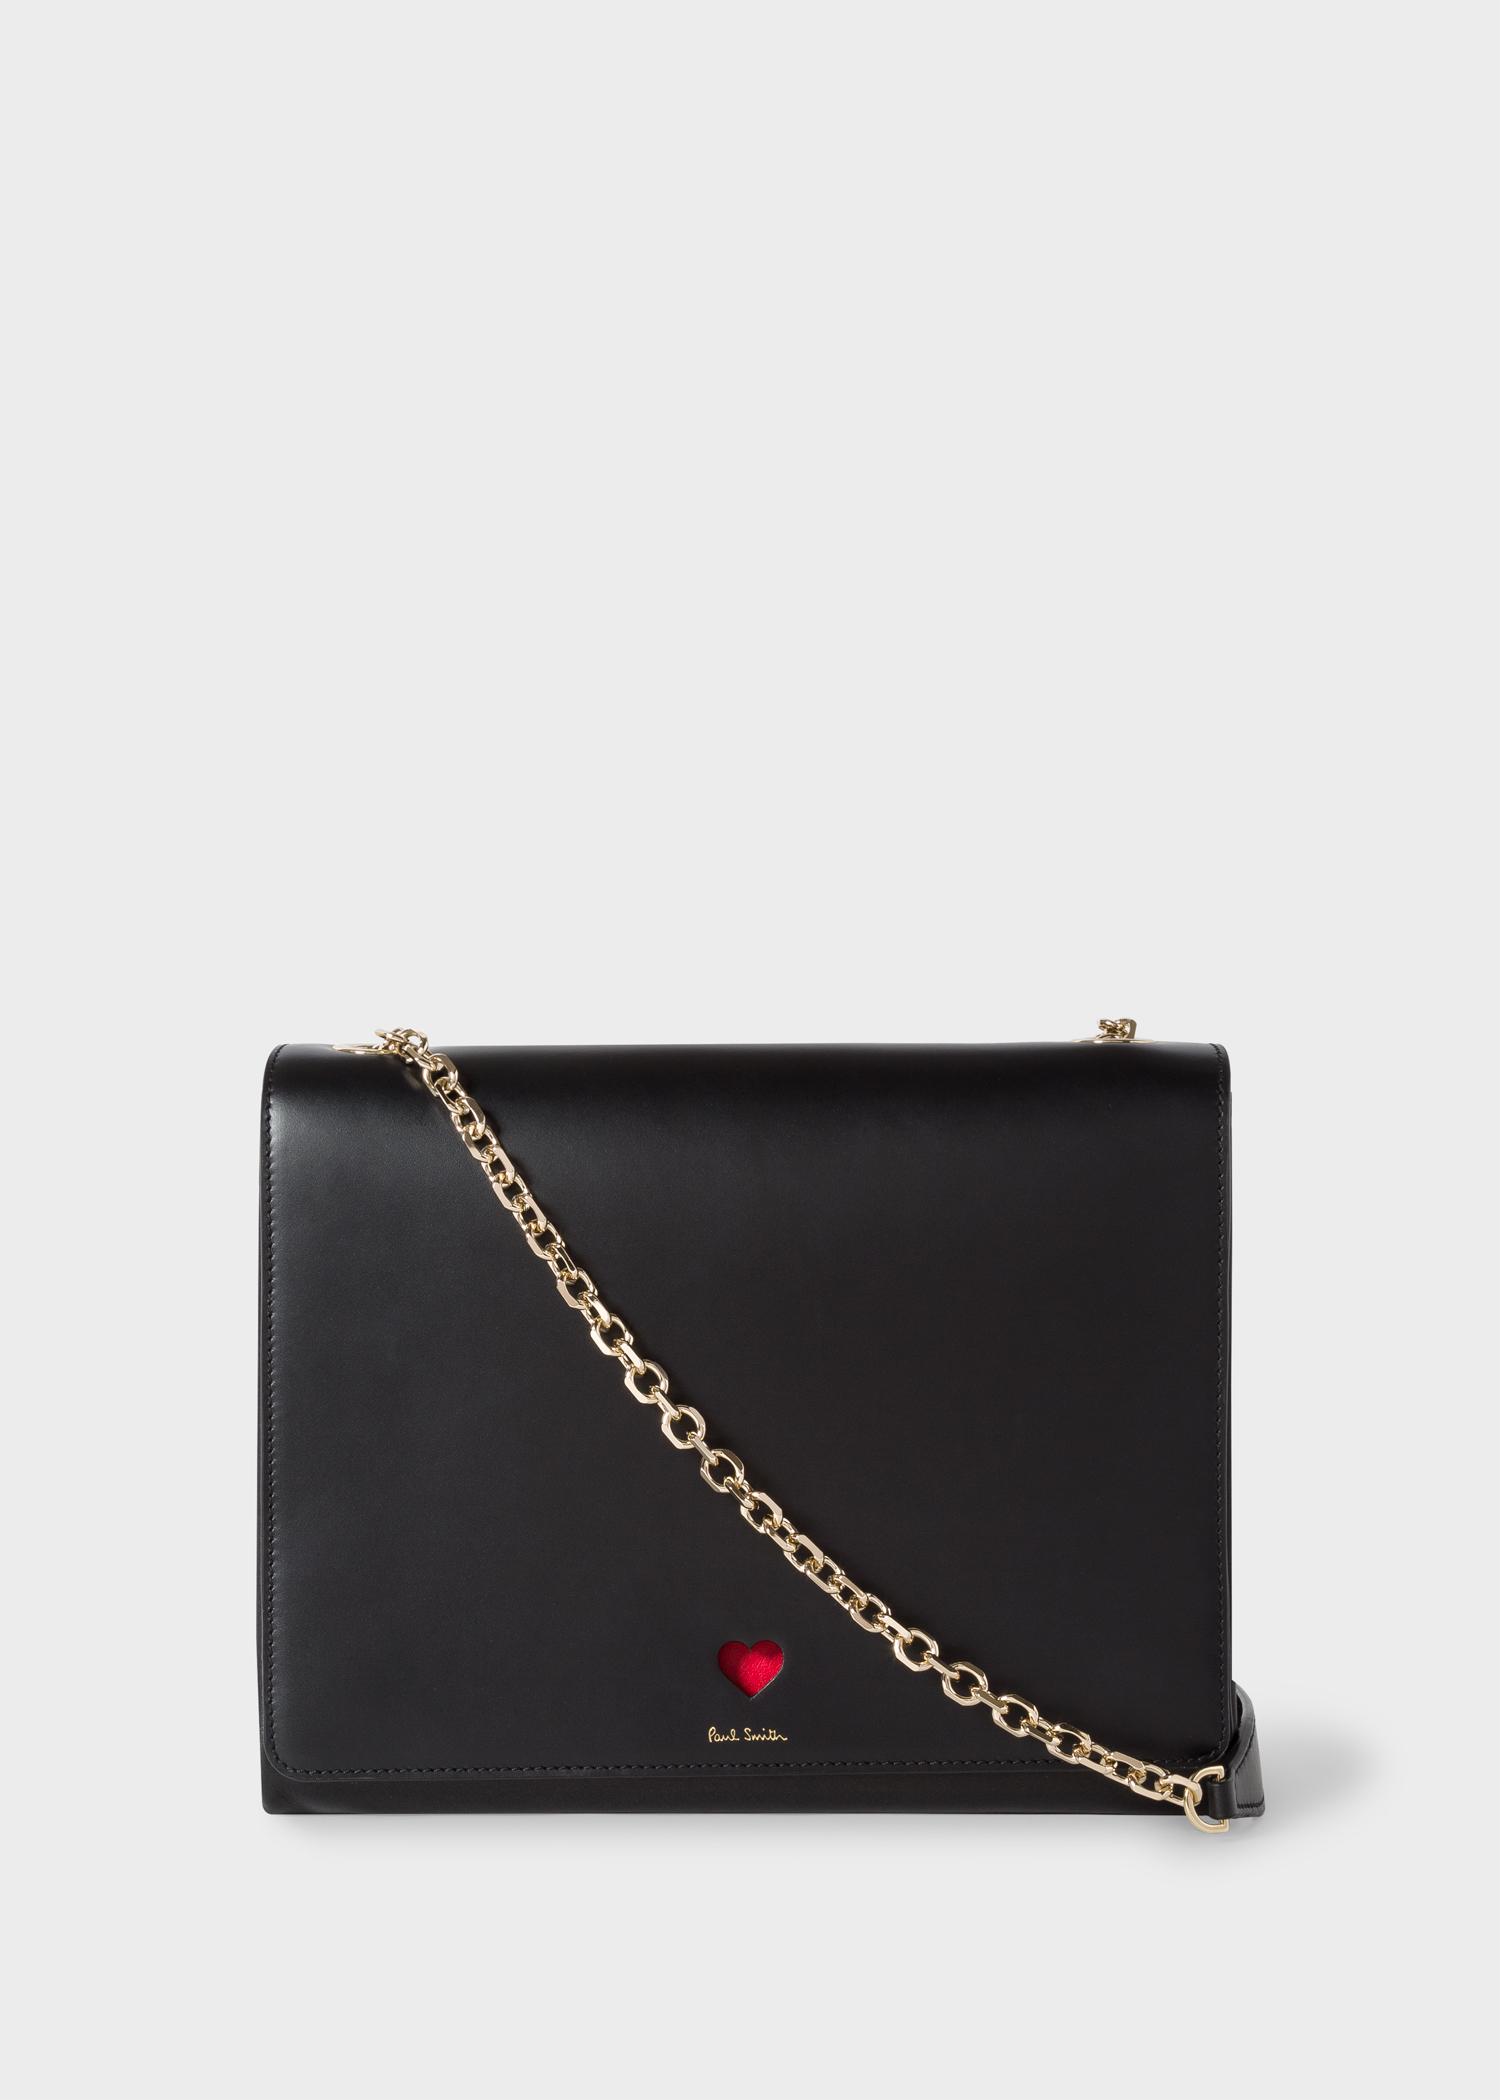 Paul Smith Women S Black Heart Leather Flap Handbag